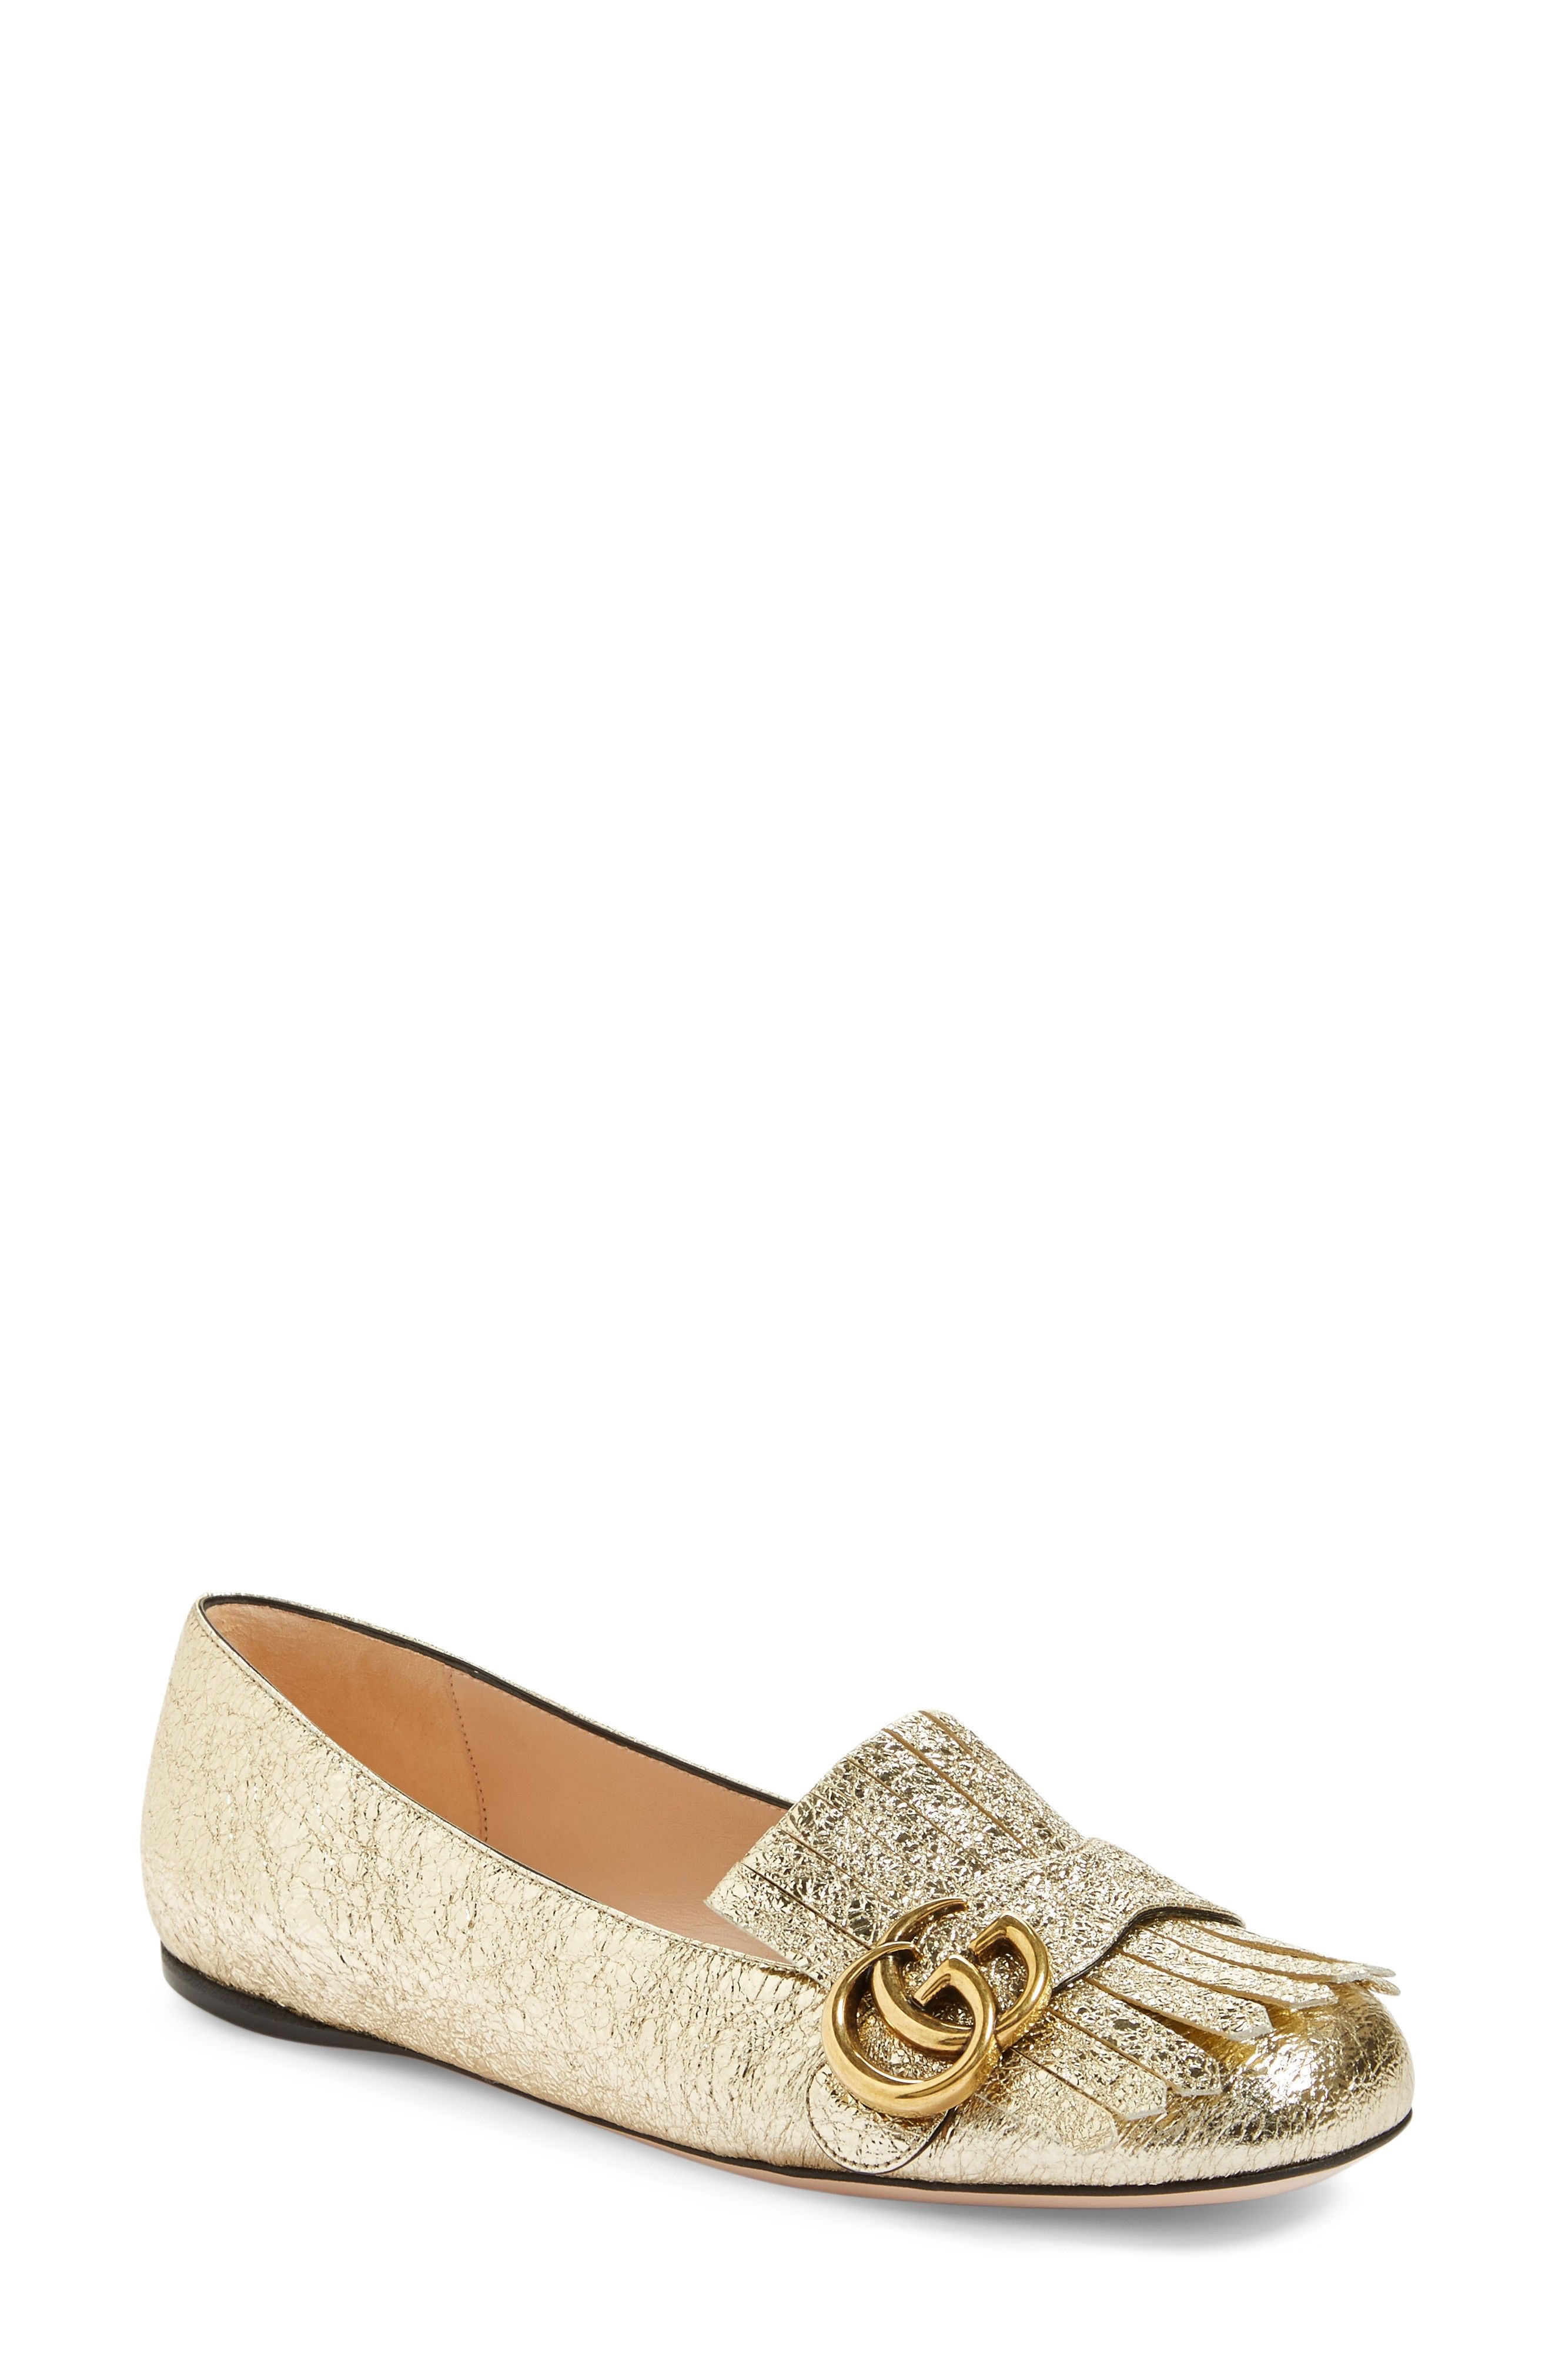 b78eb04a977 Buy GUCCI GG Marmont Flat for shopping. New GUCCI Shoes.   730  SKU  XYBF59469WTON97017